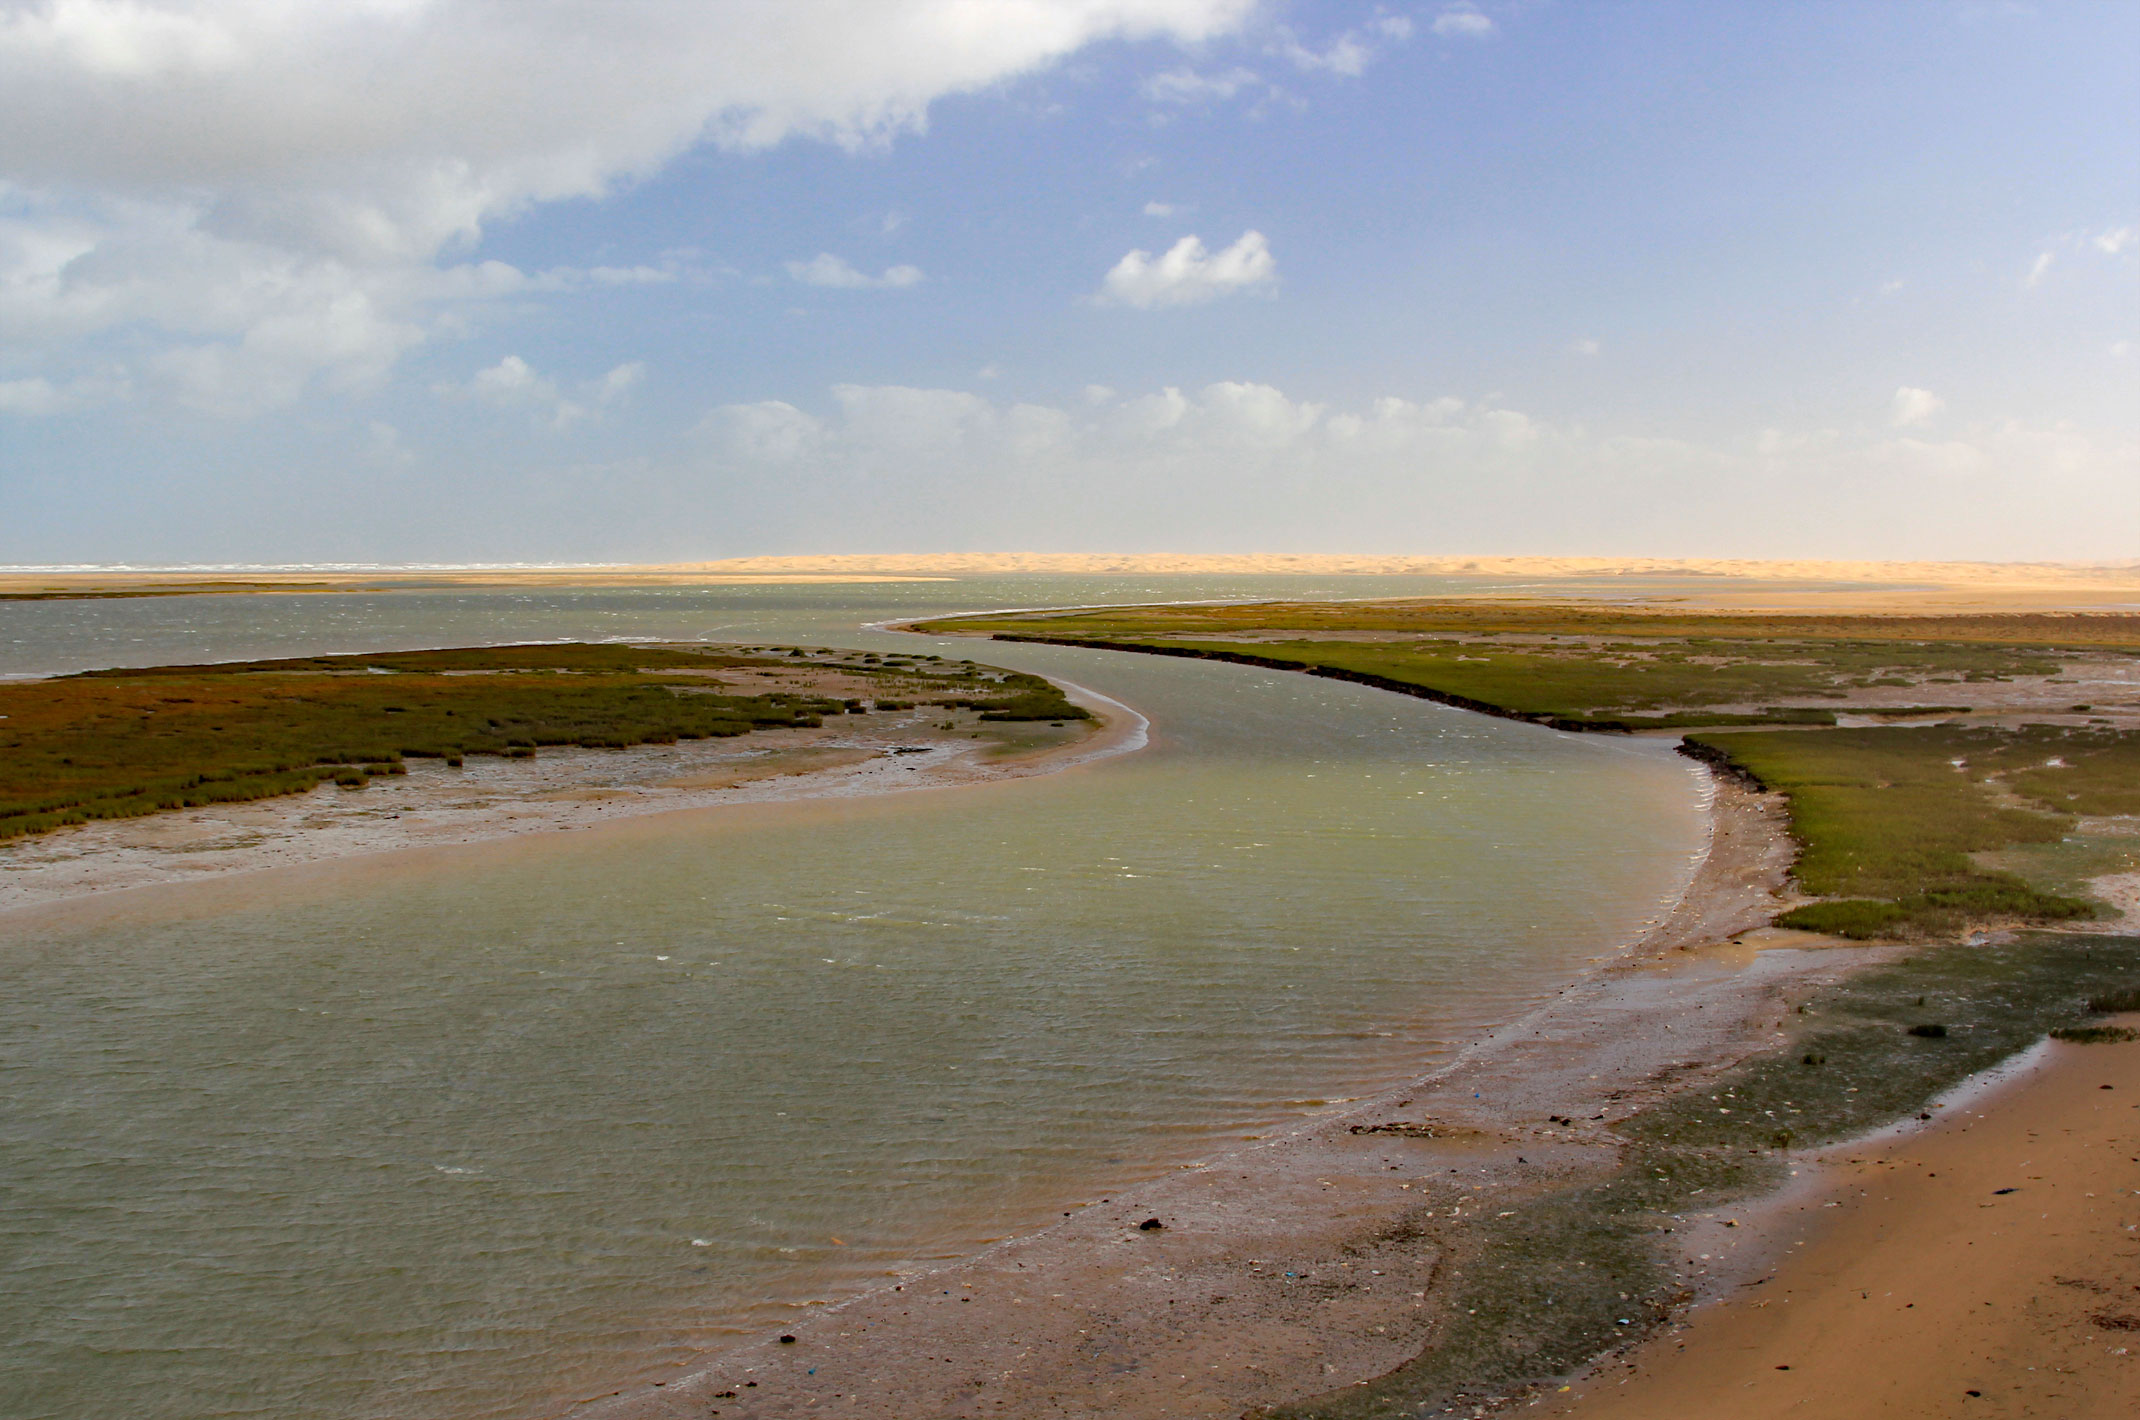 Maroko.Park Narodowy Khenifiss